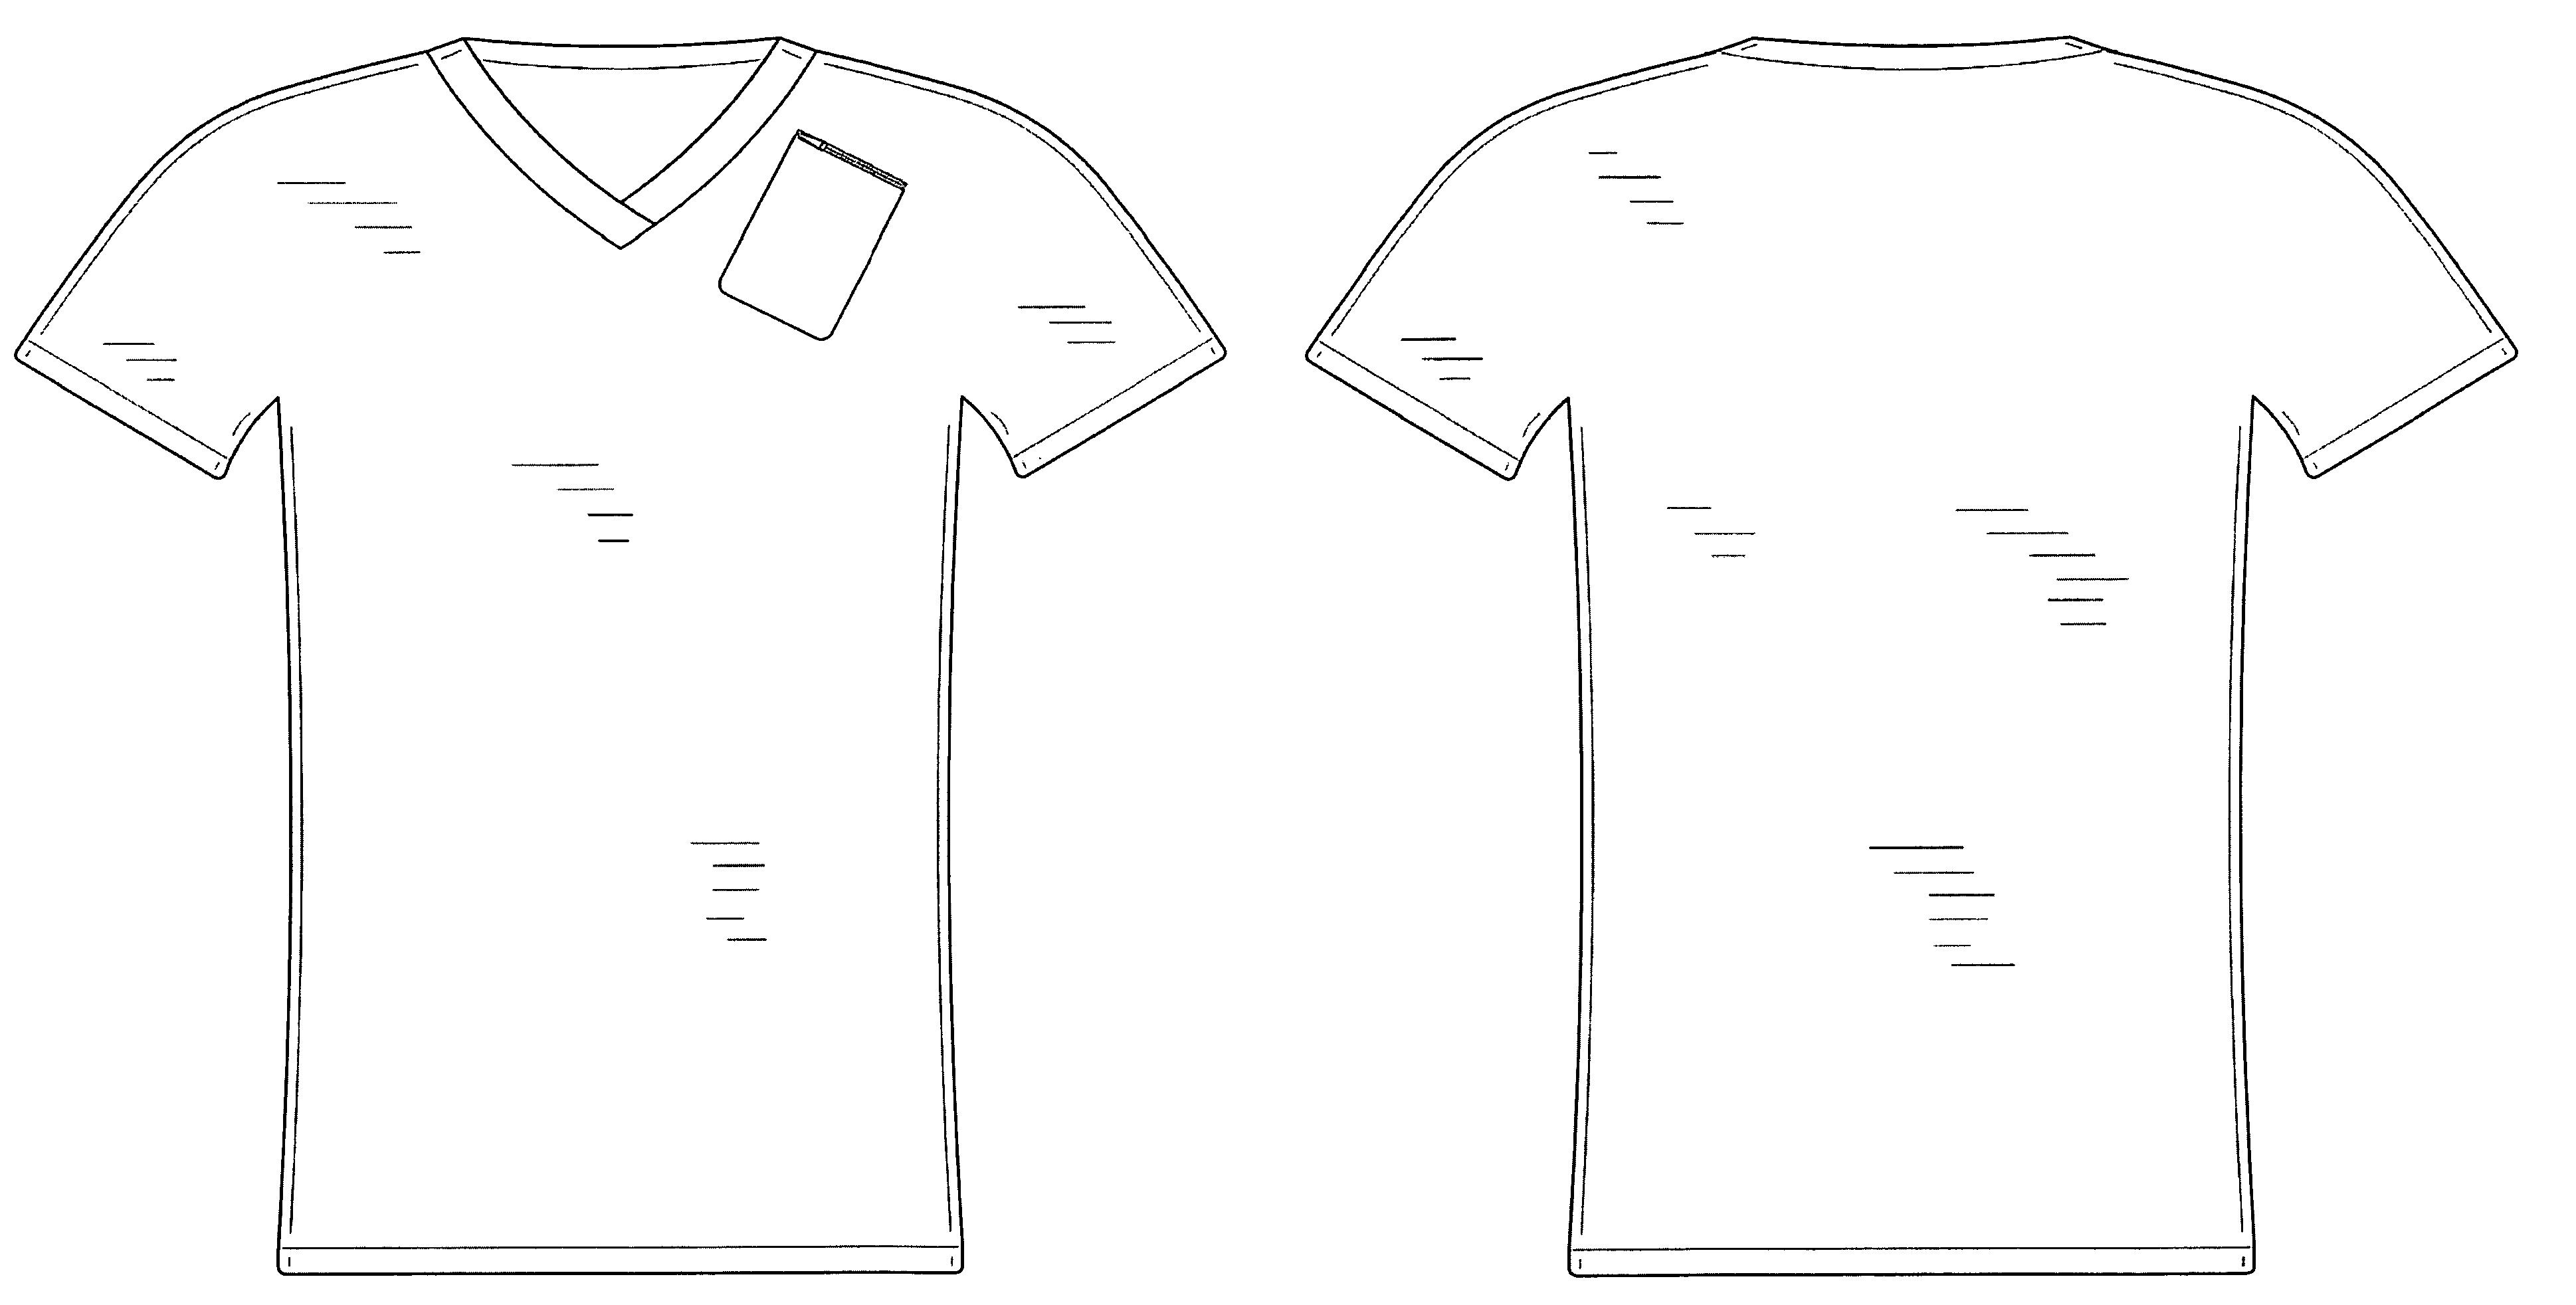 Design shirt v neck - Patent Drawing